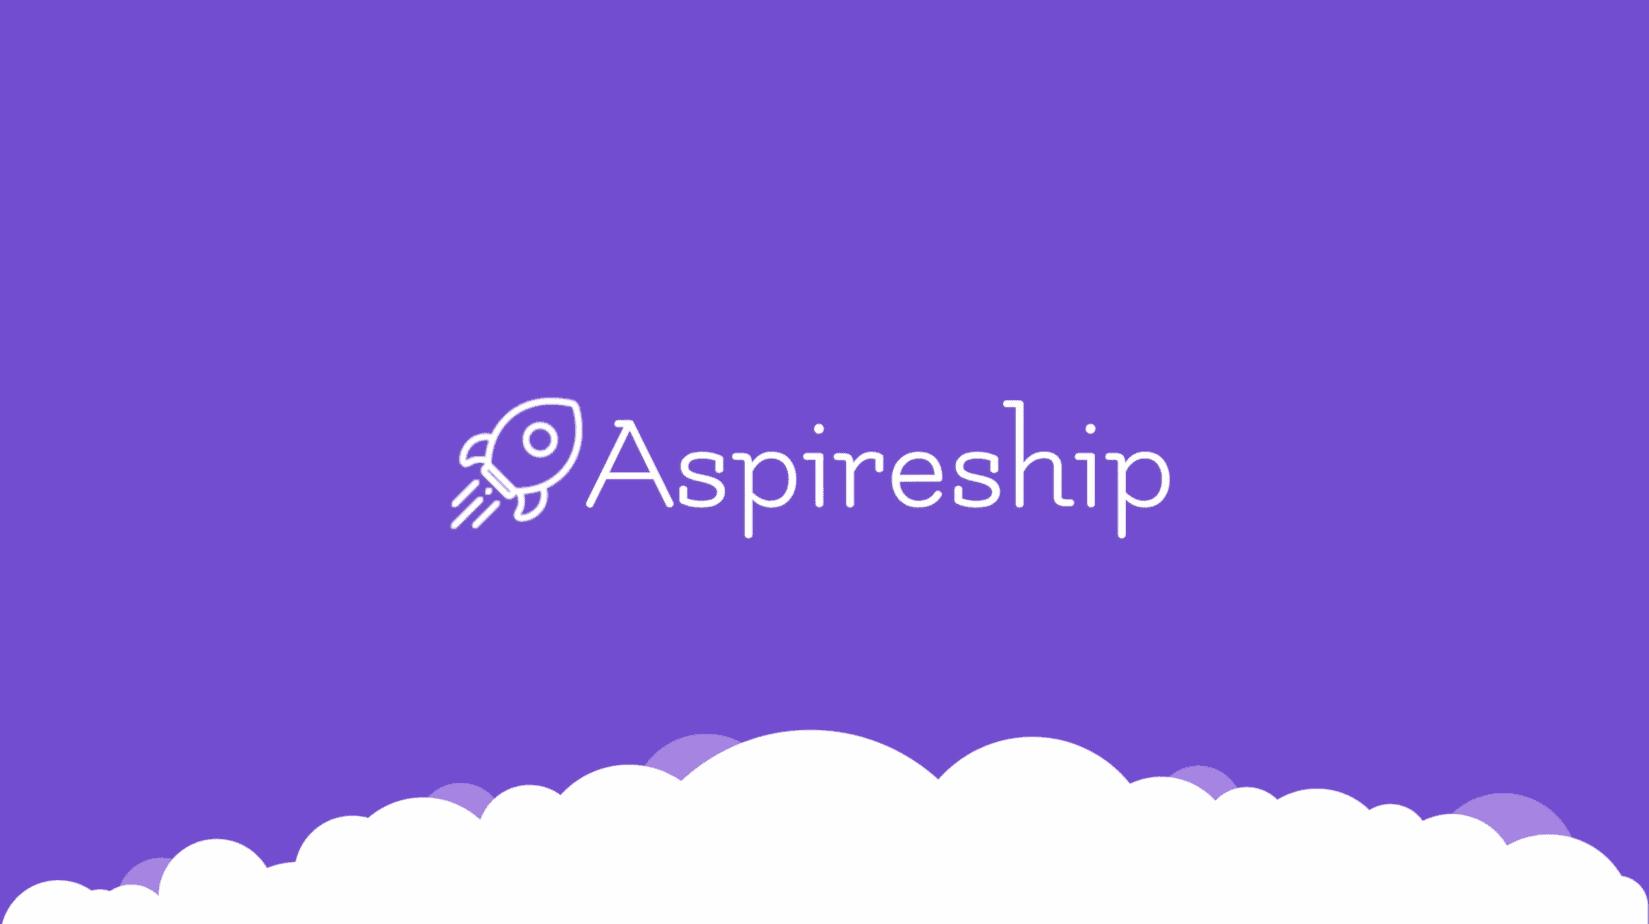 Aspireship - Career Acceleration for the Modern Workforce